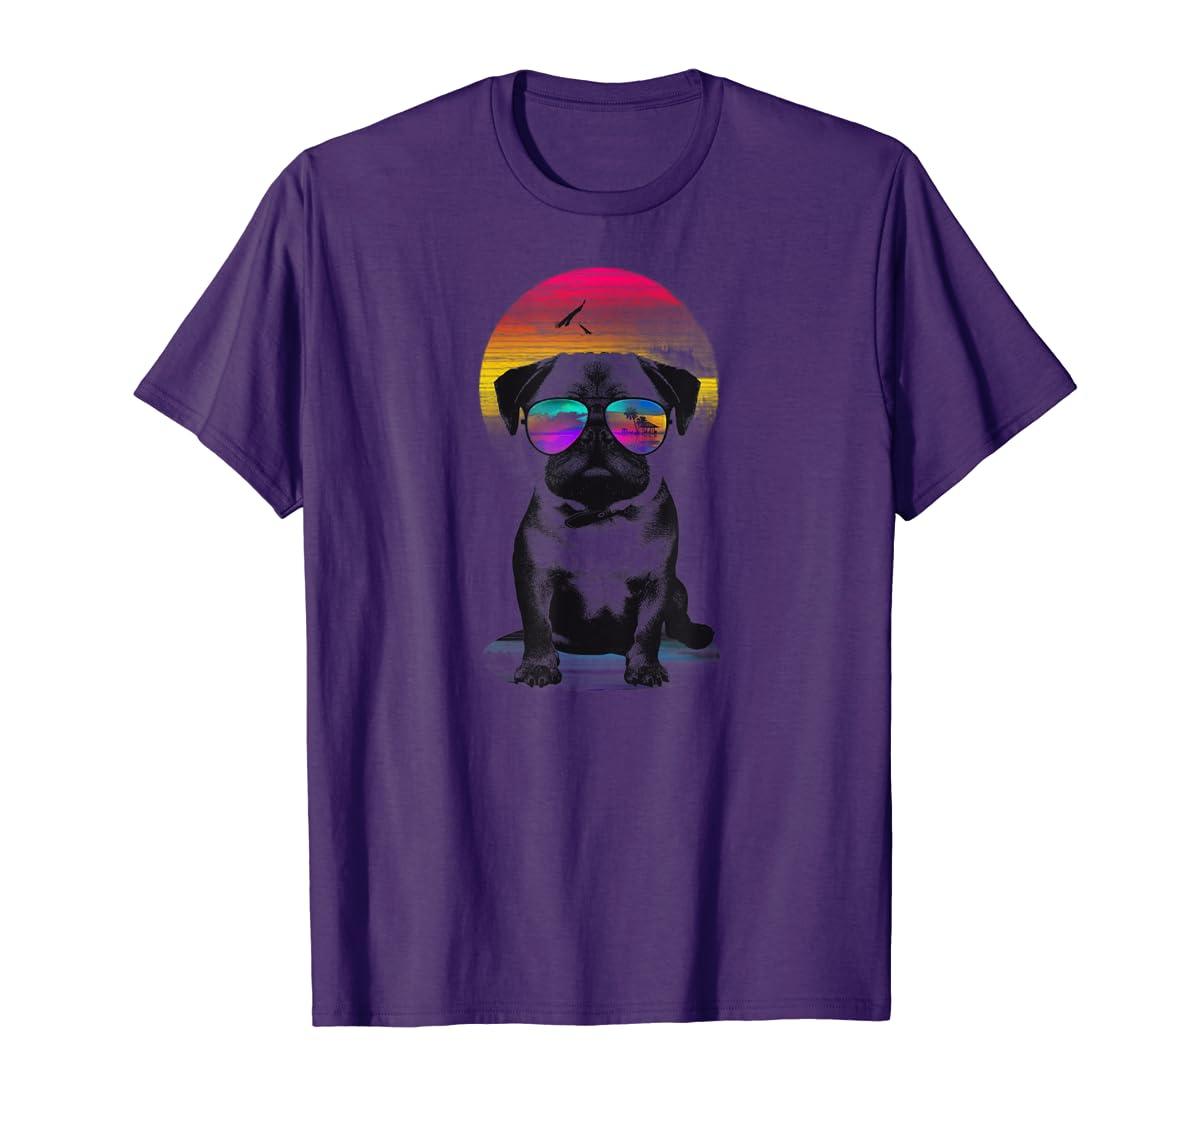 Holiday Sunglasses Pug T-shirt for Women, Men-Men's T-Shirt-Purple